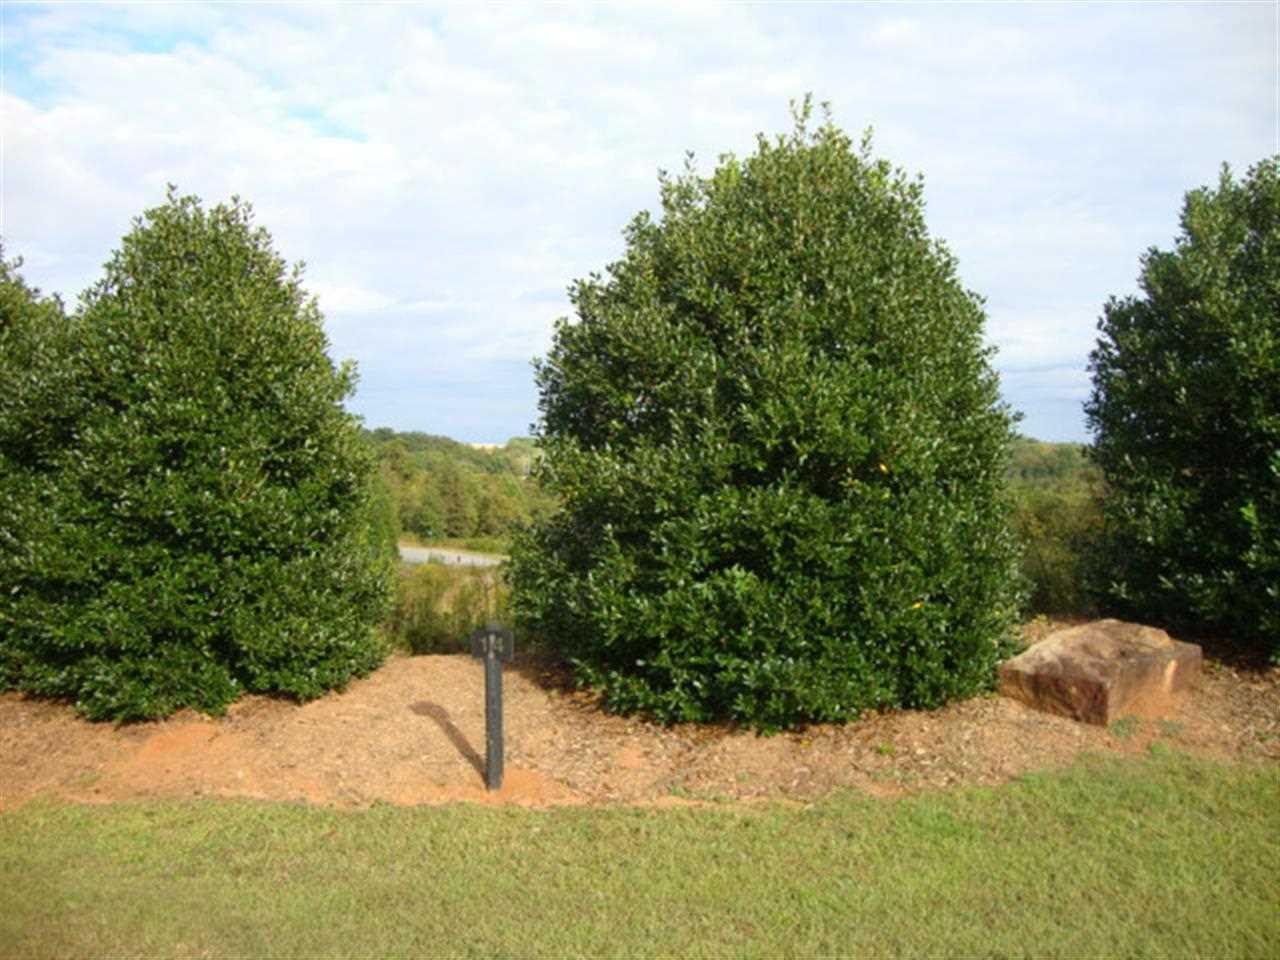 Real Estate for Sale, ListingId: 27554030, Powdersville,SC29673